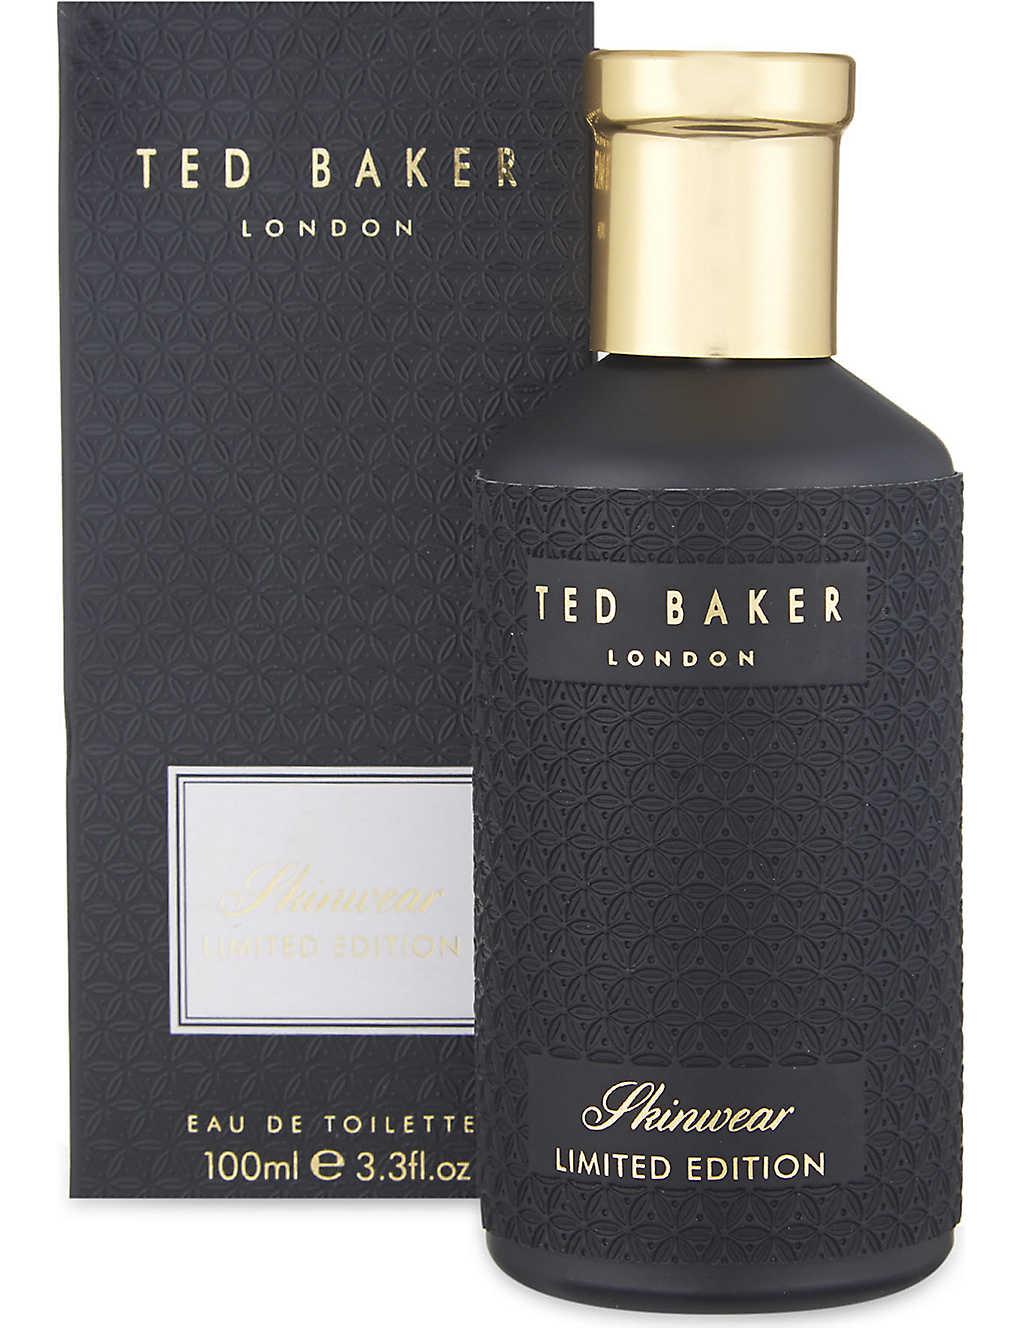 0275b07b55 TED BAKER - Skinwear limited edition edt 100ml | Selfridges.com